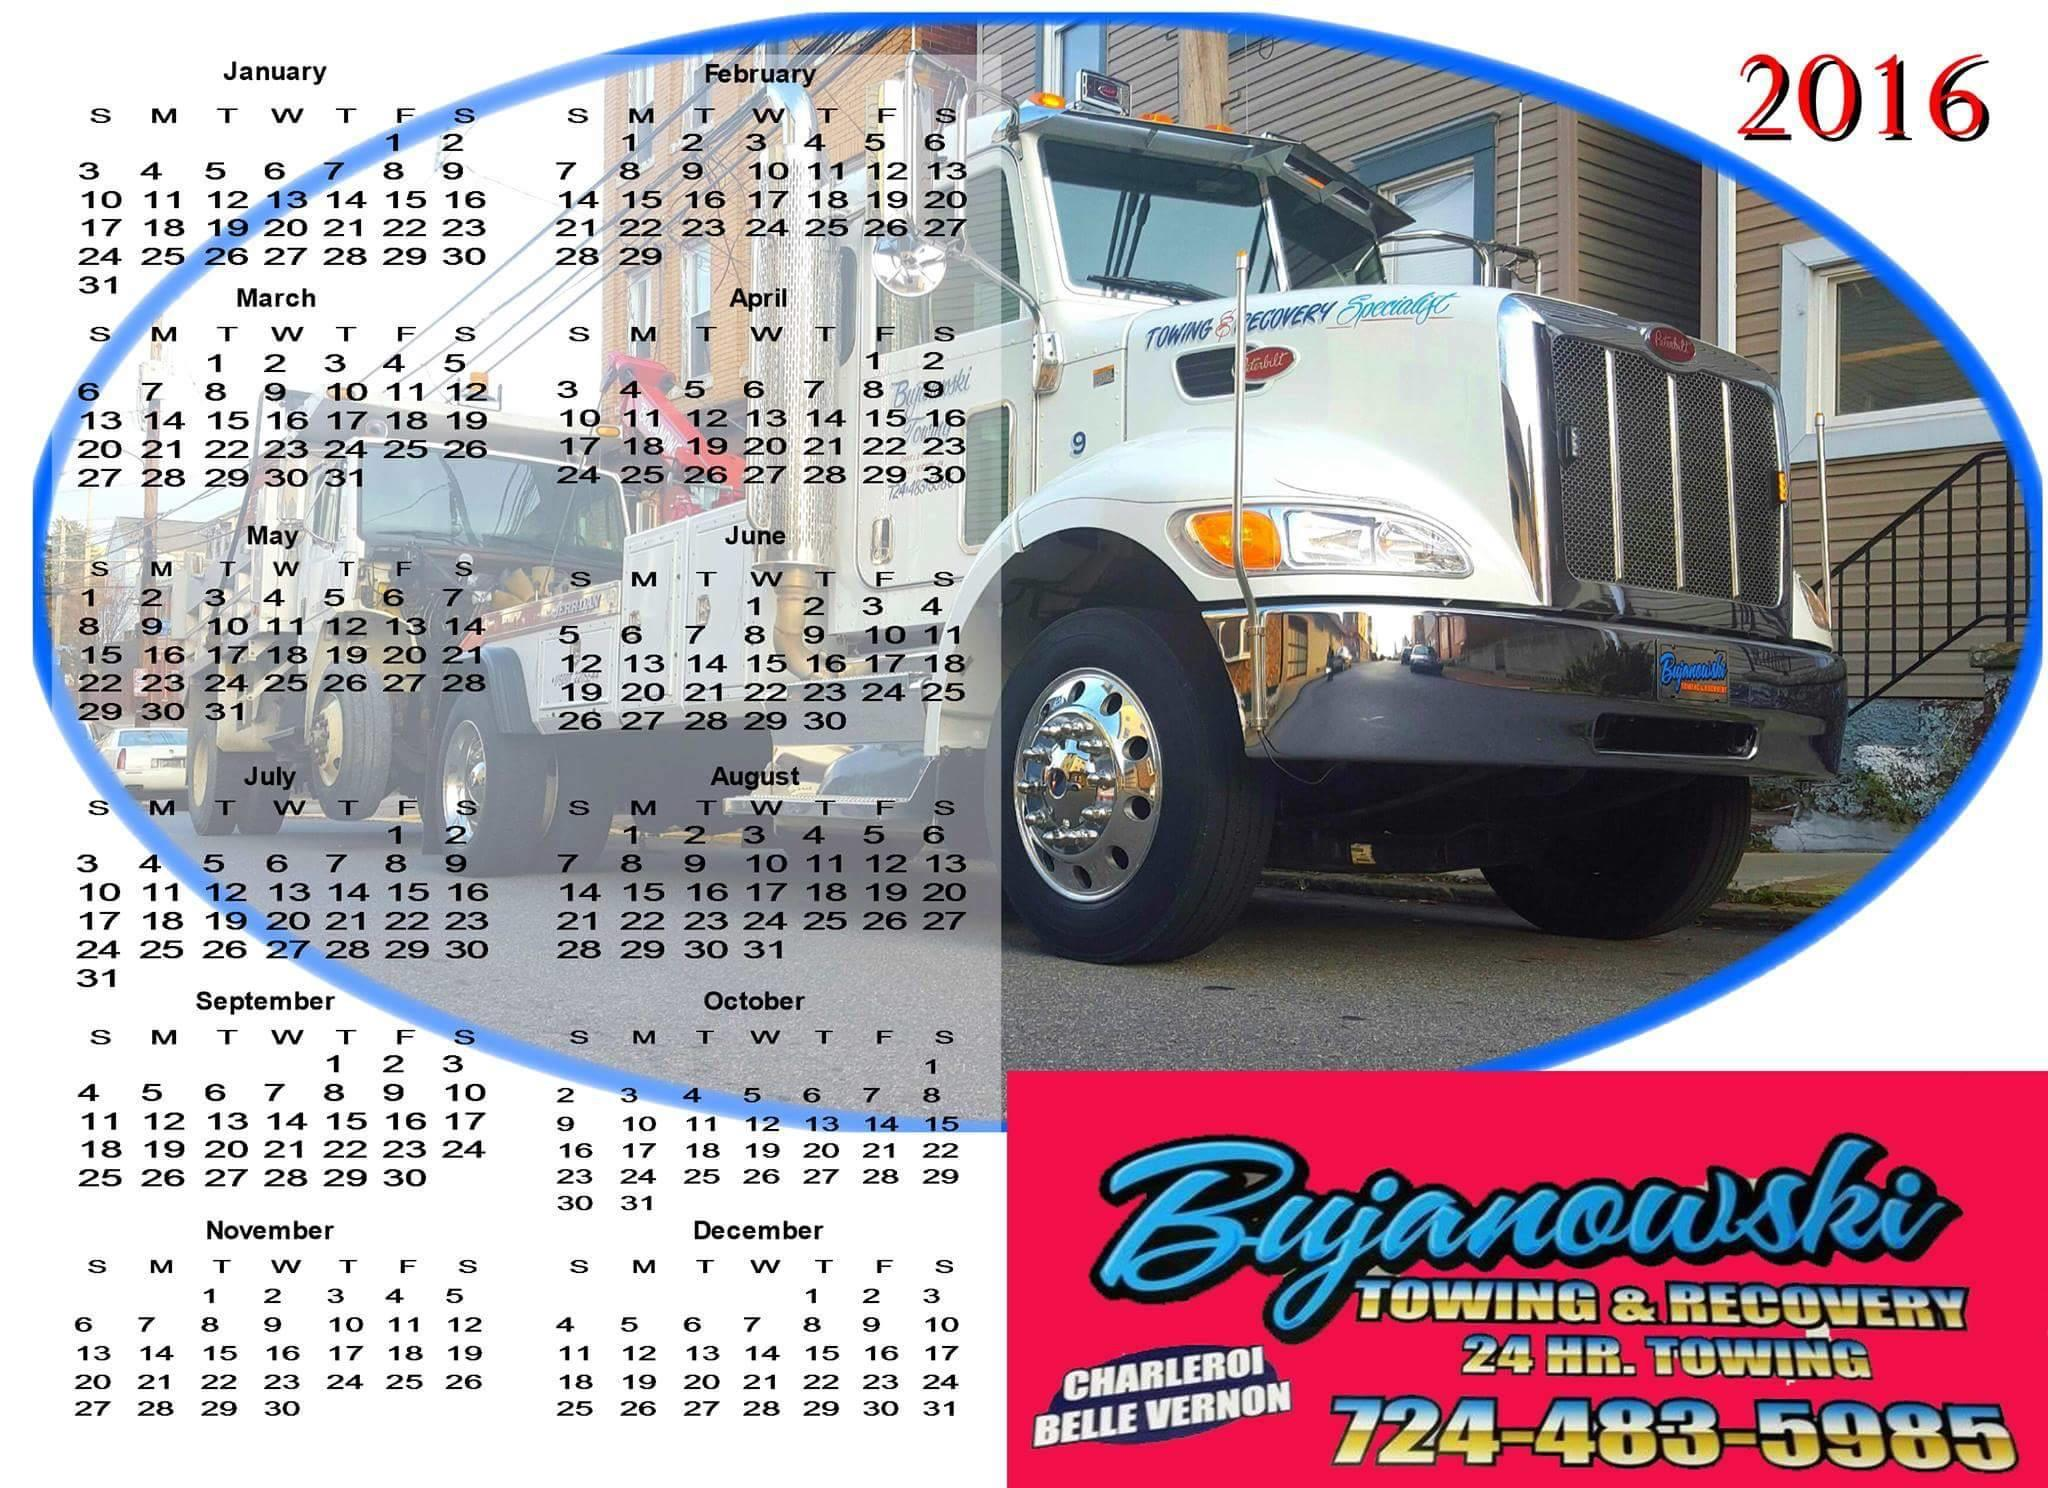 Bujanowski Towing Service image 2